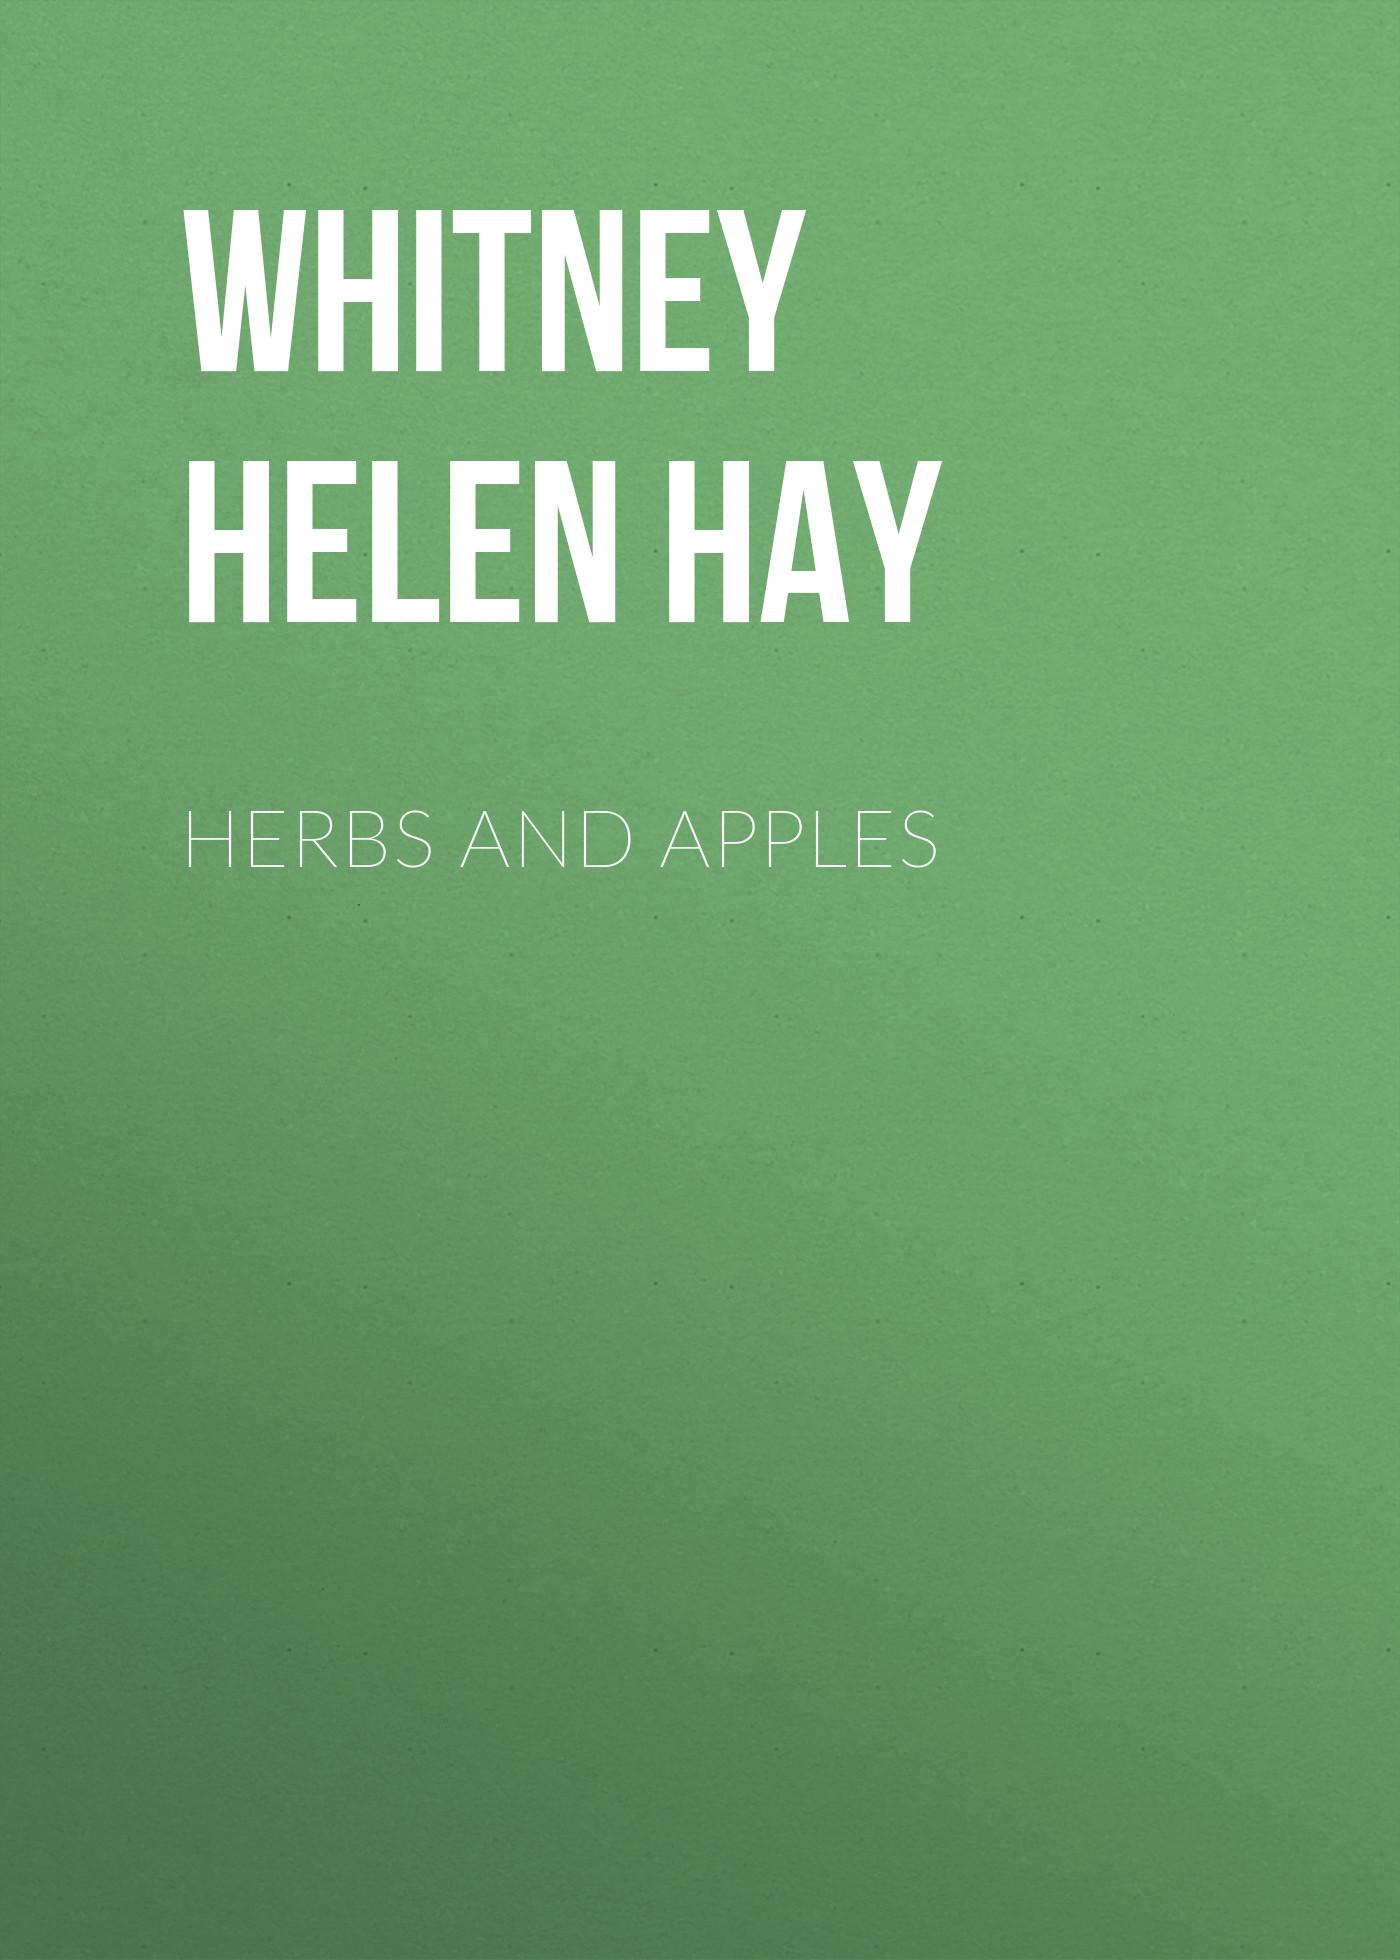 Whitney Helen Hay Herbs and Apples whitney helen hay gypsy verses